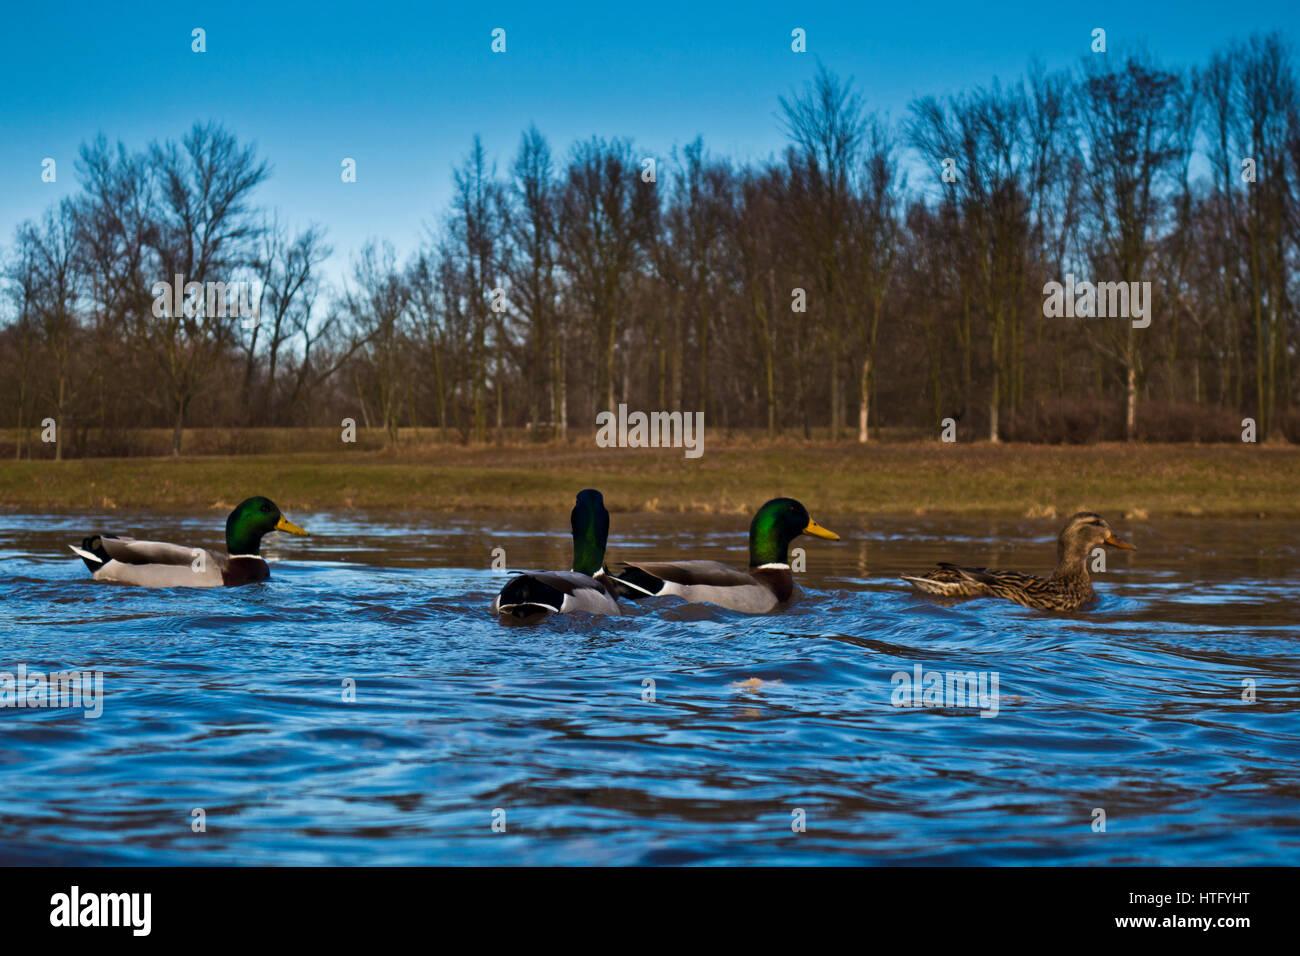 Mallard ducks swimming in the river, low angle view - Stock Image